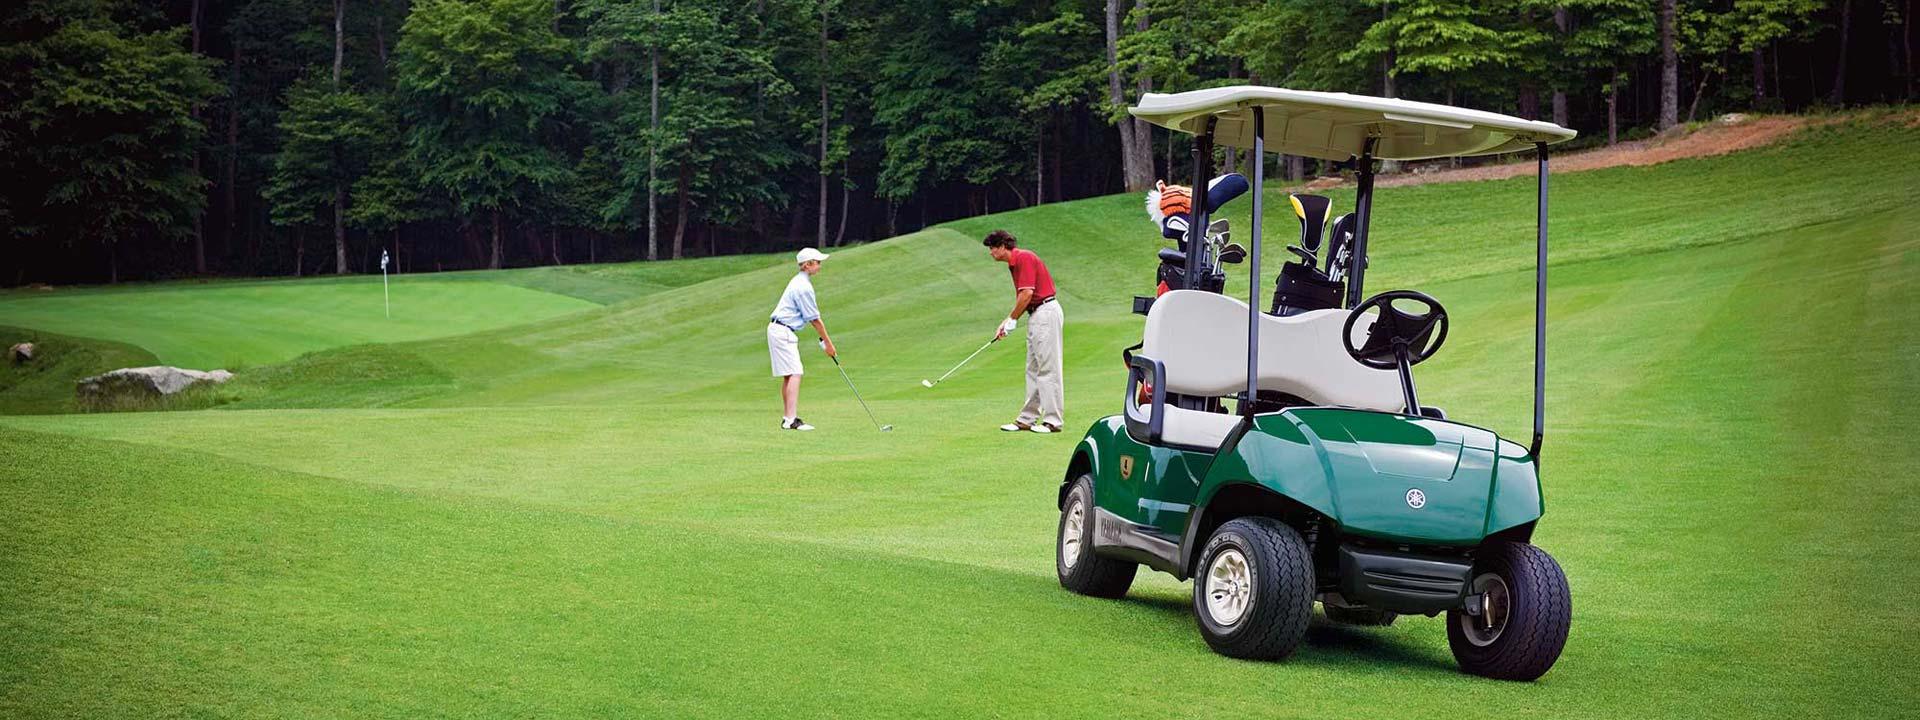 Fairway golf car sales service parts repair long for Narrow golf cart